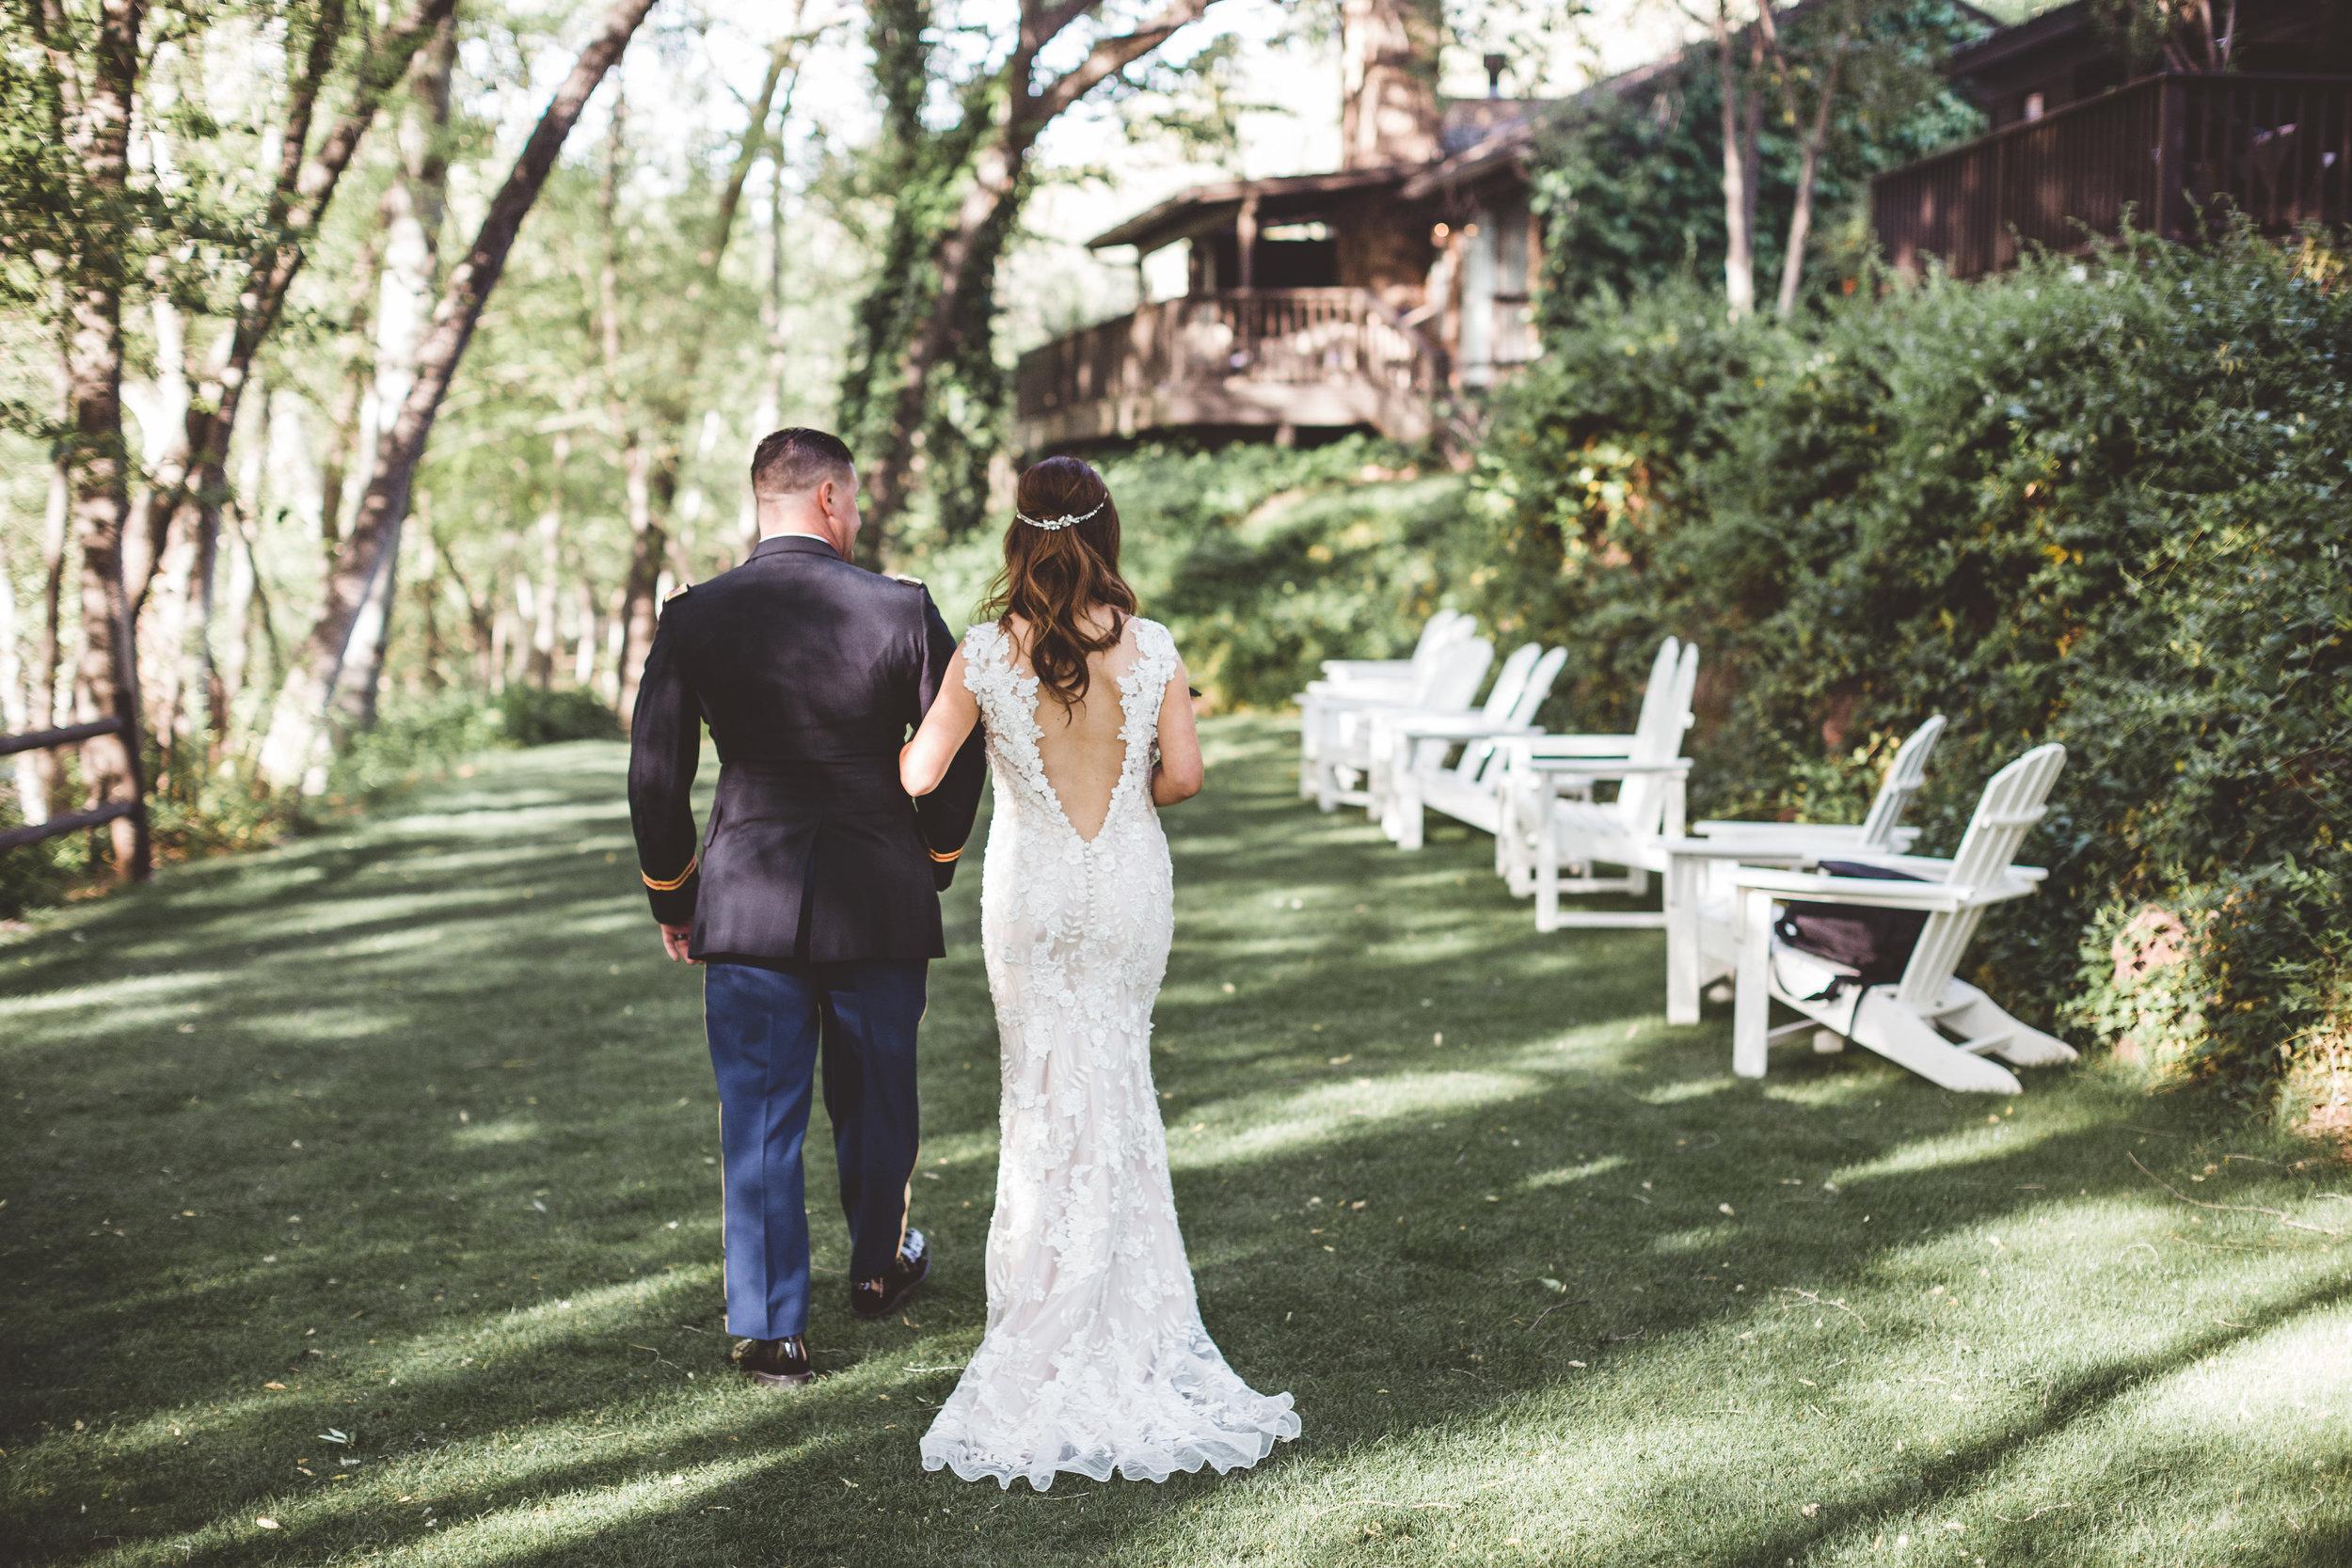 jenna-and-erics-romantic-sedona-wedding23.jpg